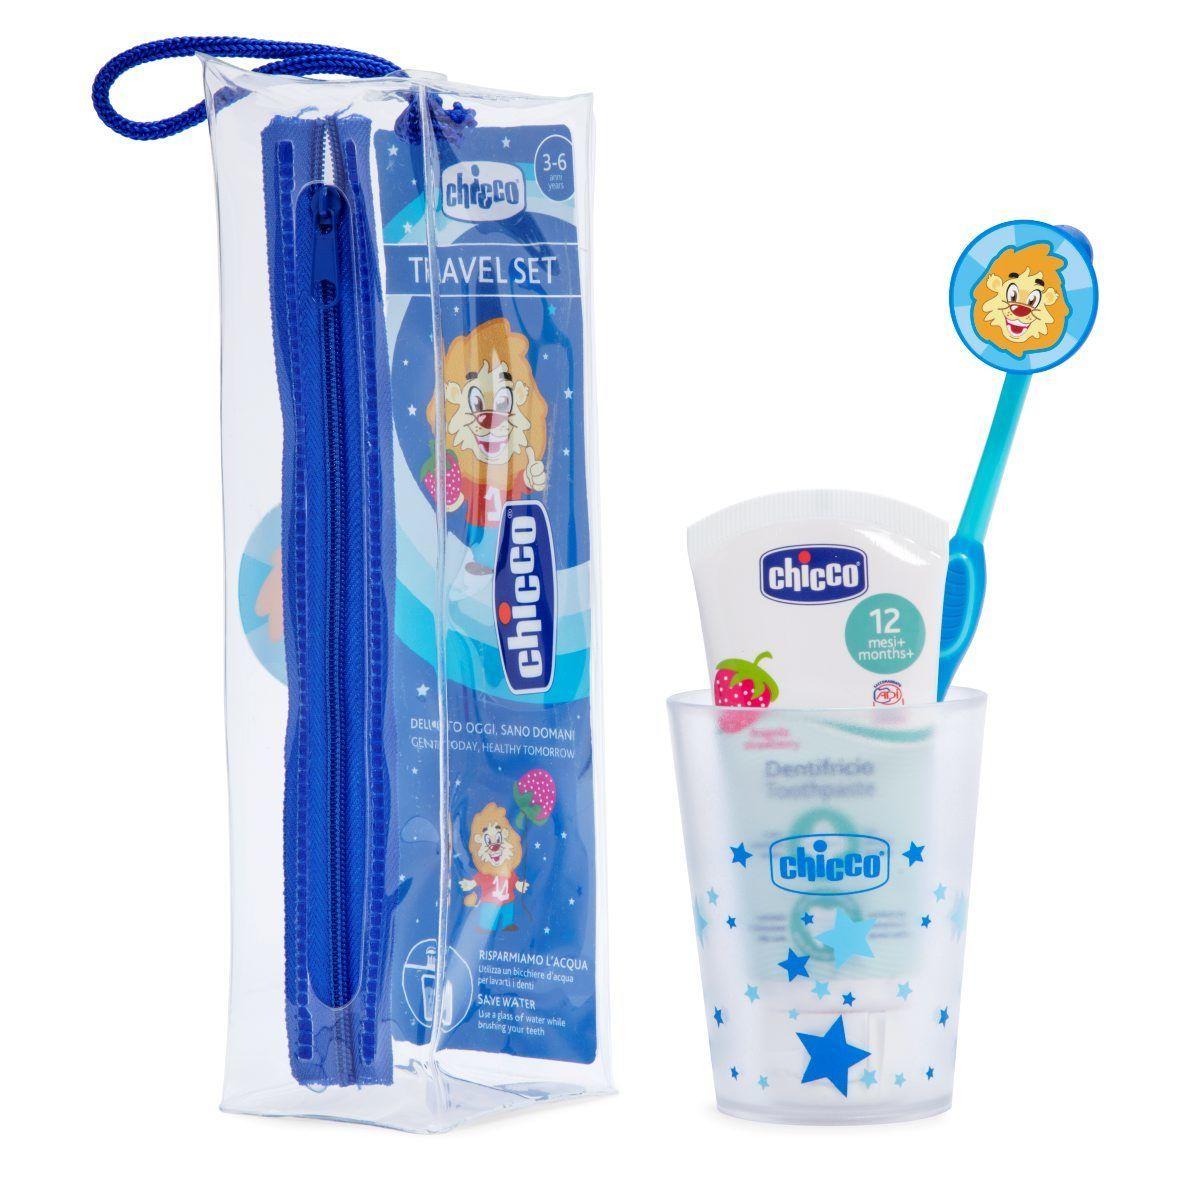 Set de igiena orala Chicco, albastru, 36luni+ (pasta dinti, periuta, pahar, etui)